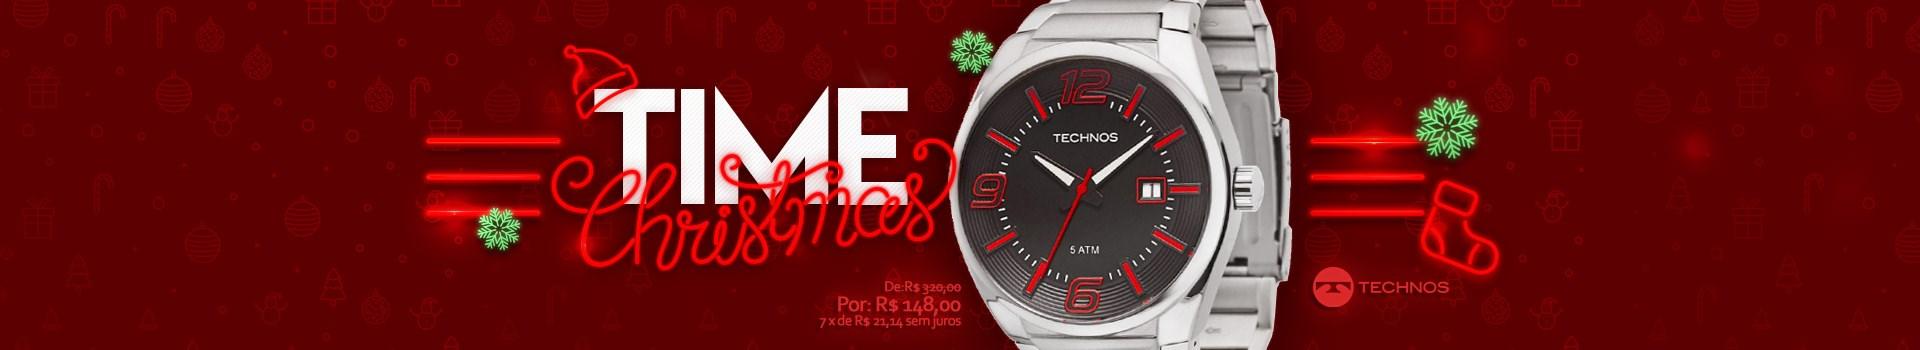 Natal Technos